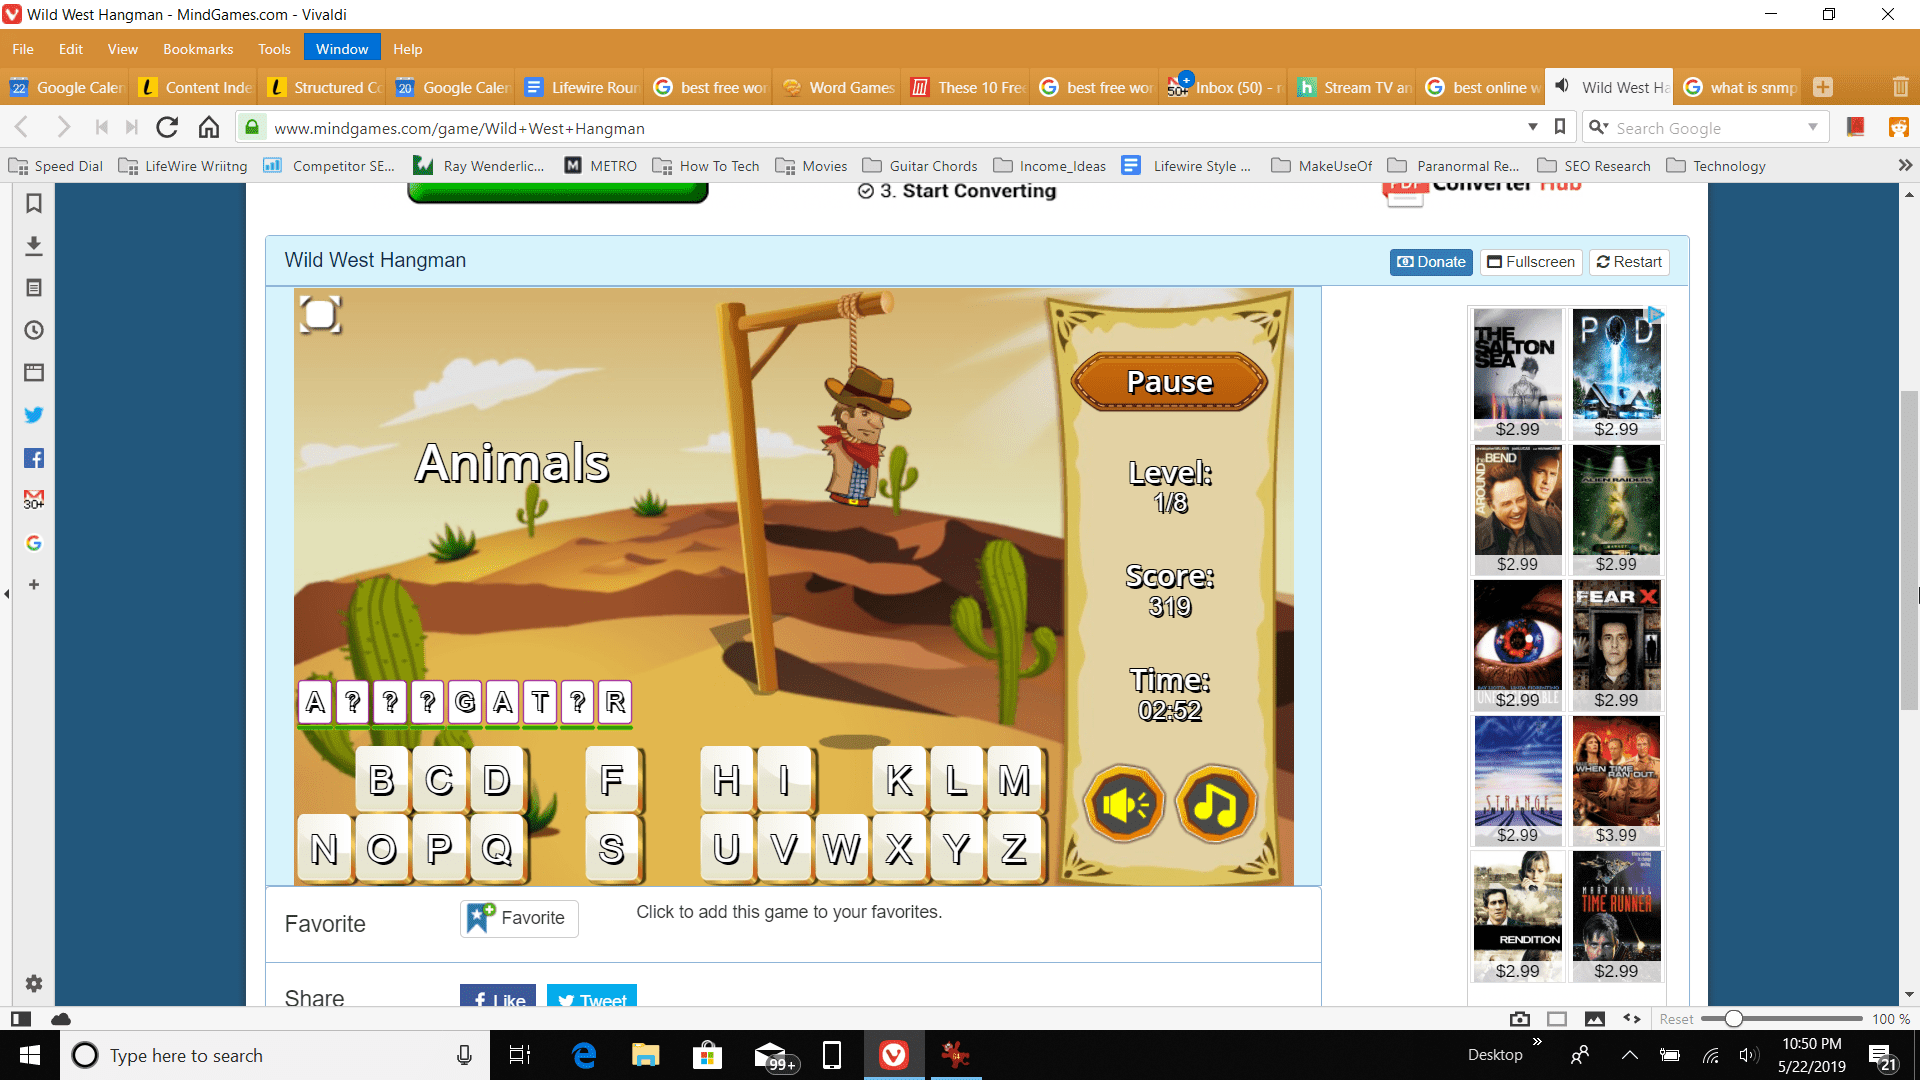 Screenshot of playing Wild West Hangman